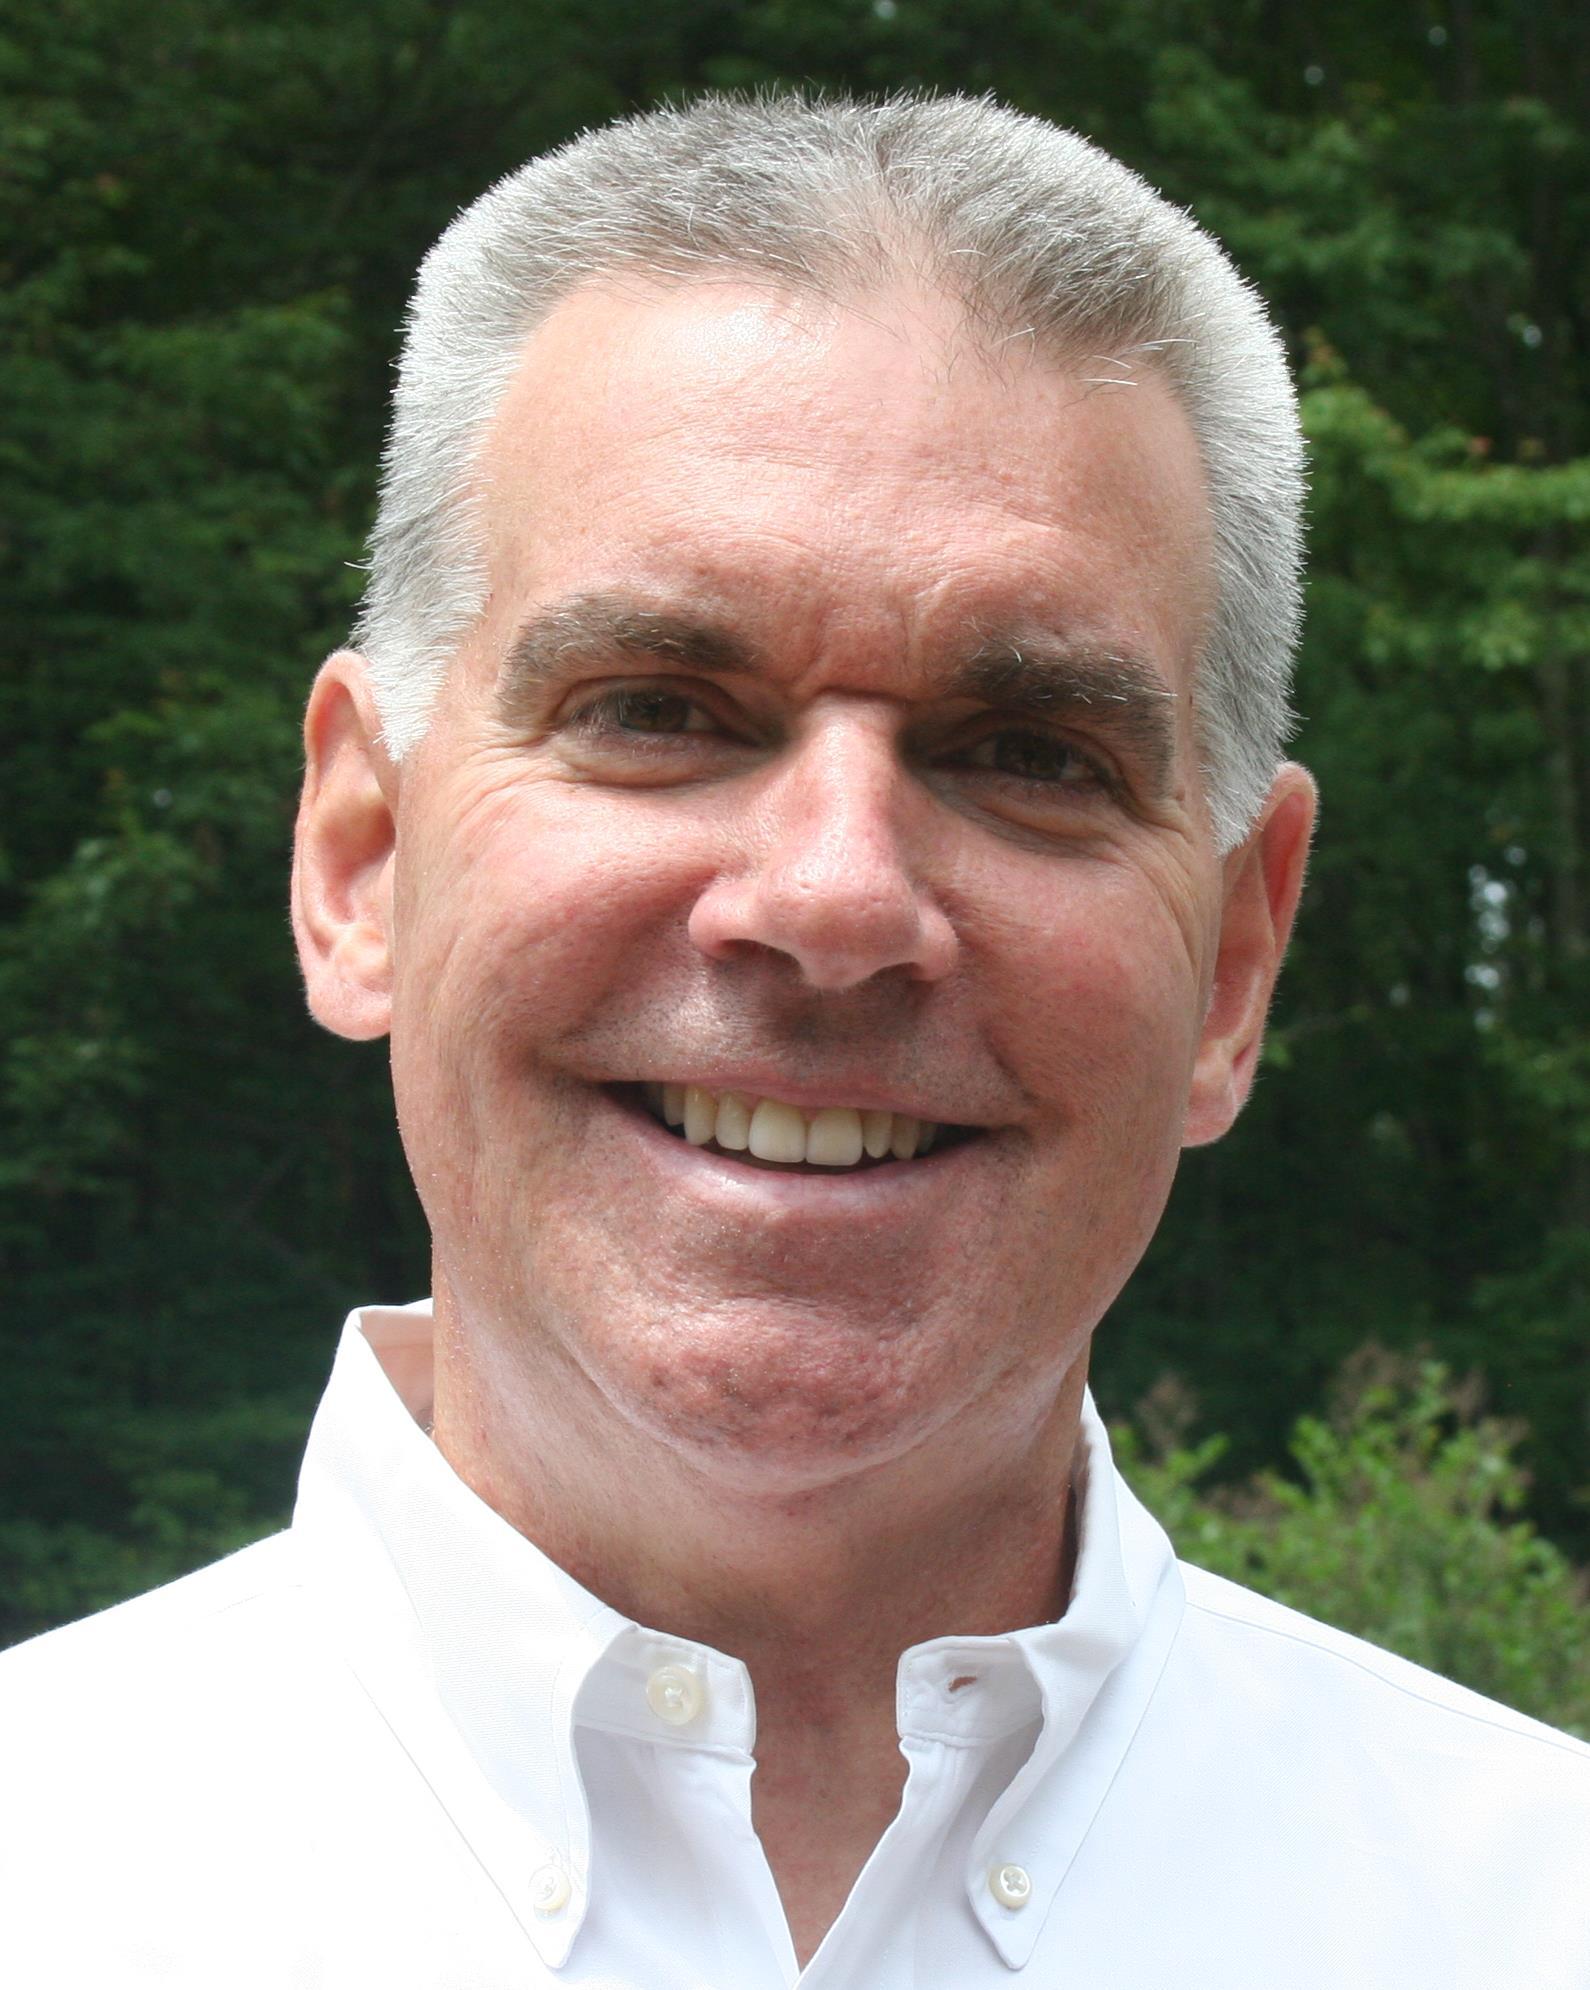 Laser Facility Taps FM Industry Veteran Joe Fairley as New Director of Business Development